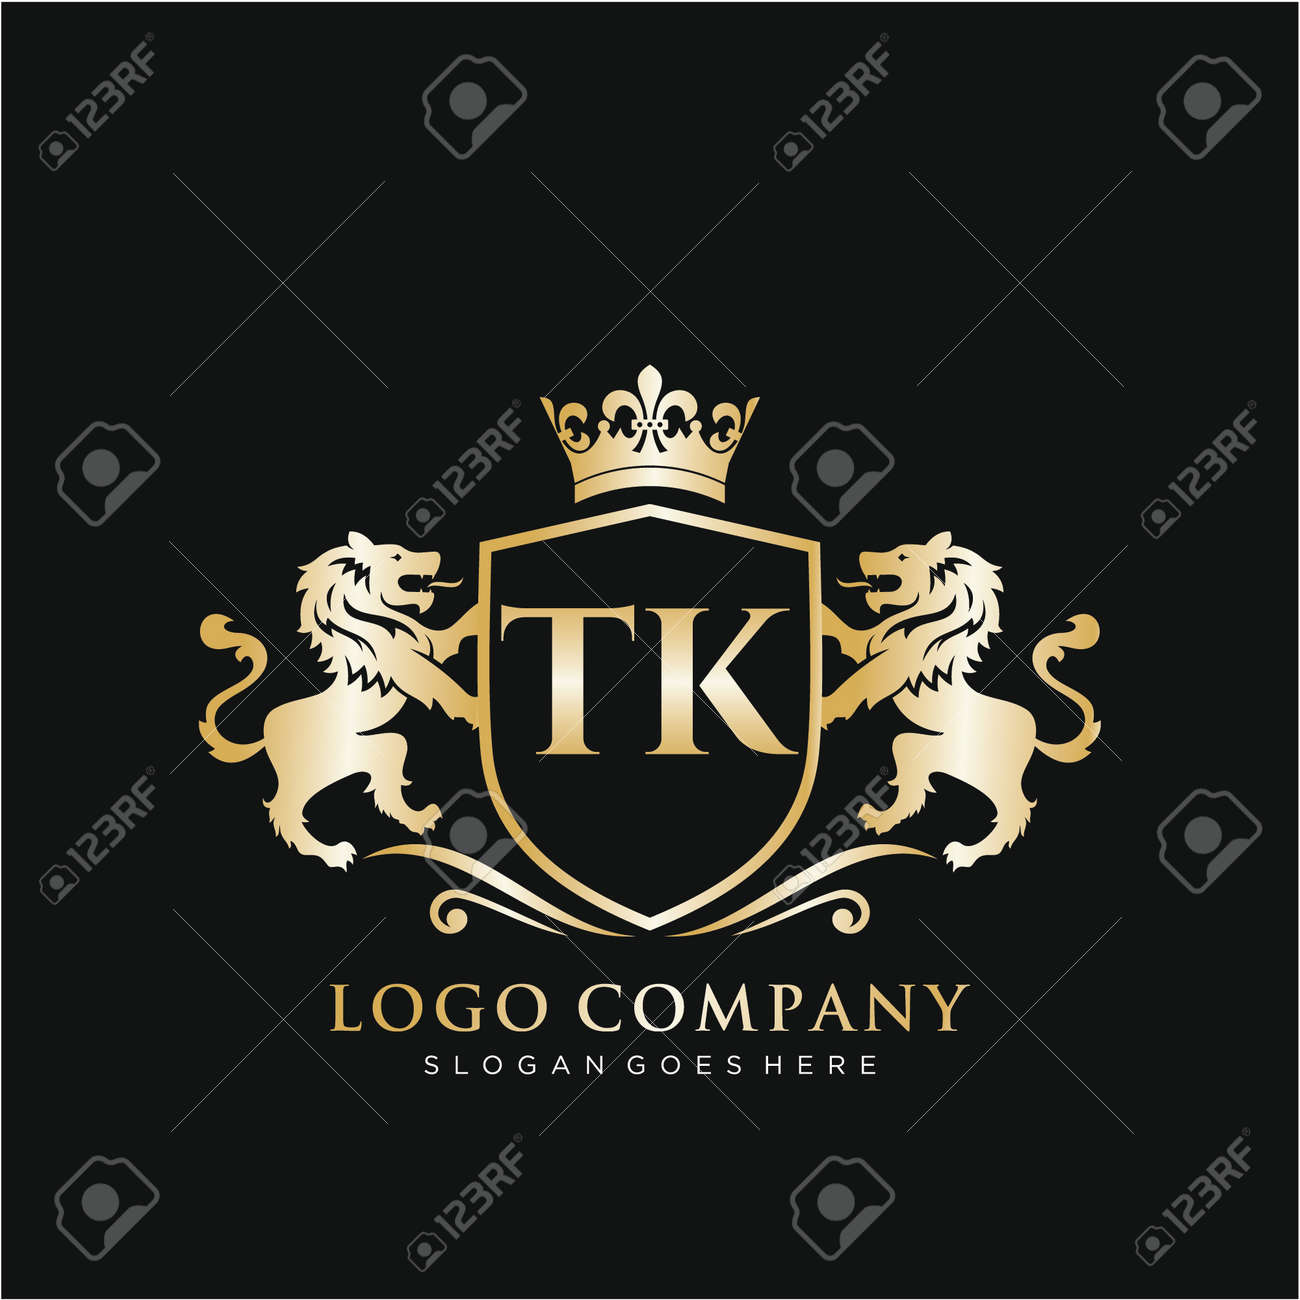 Initial handwriting logo design Beautyful designhandwritten logo for fashion, team, wedding, luxury logo. - 150504612